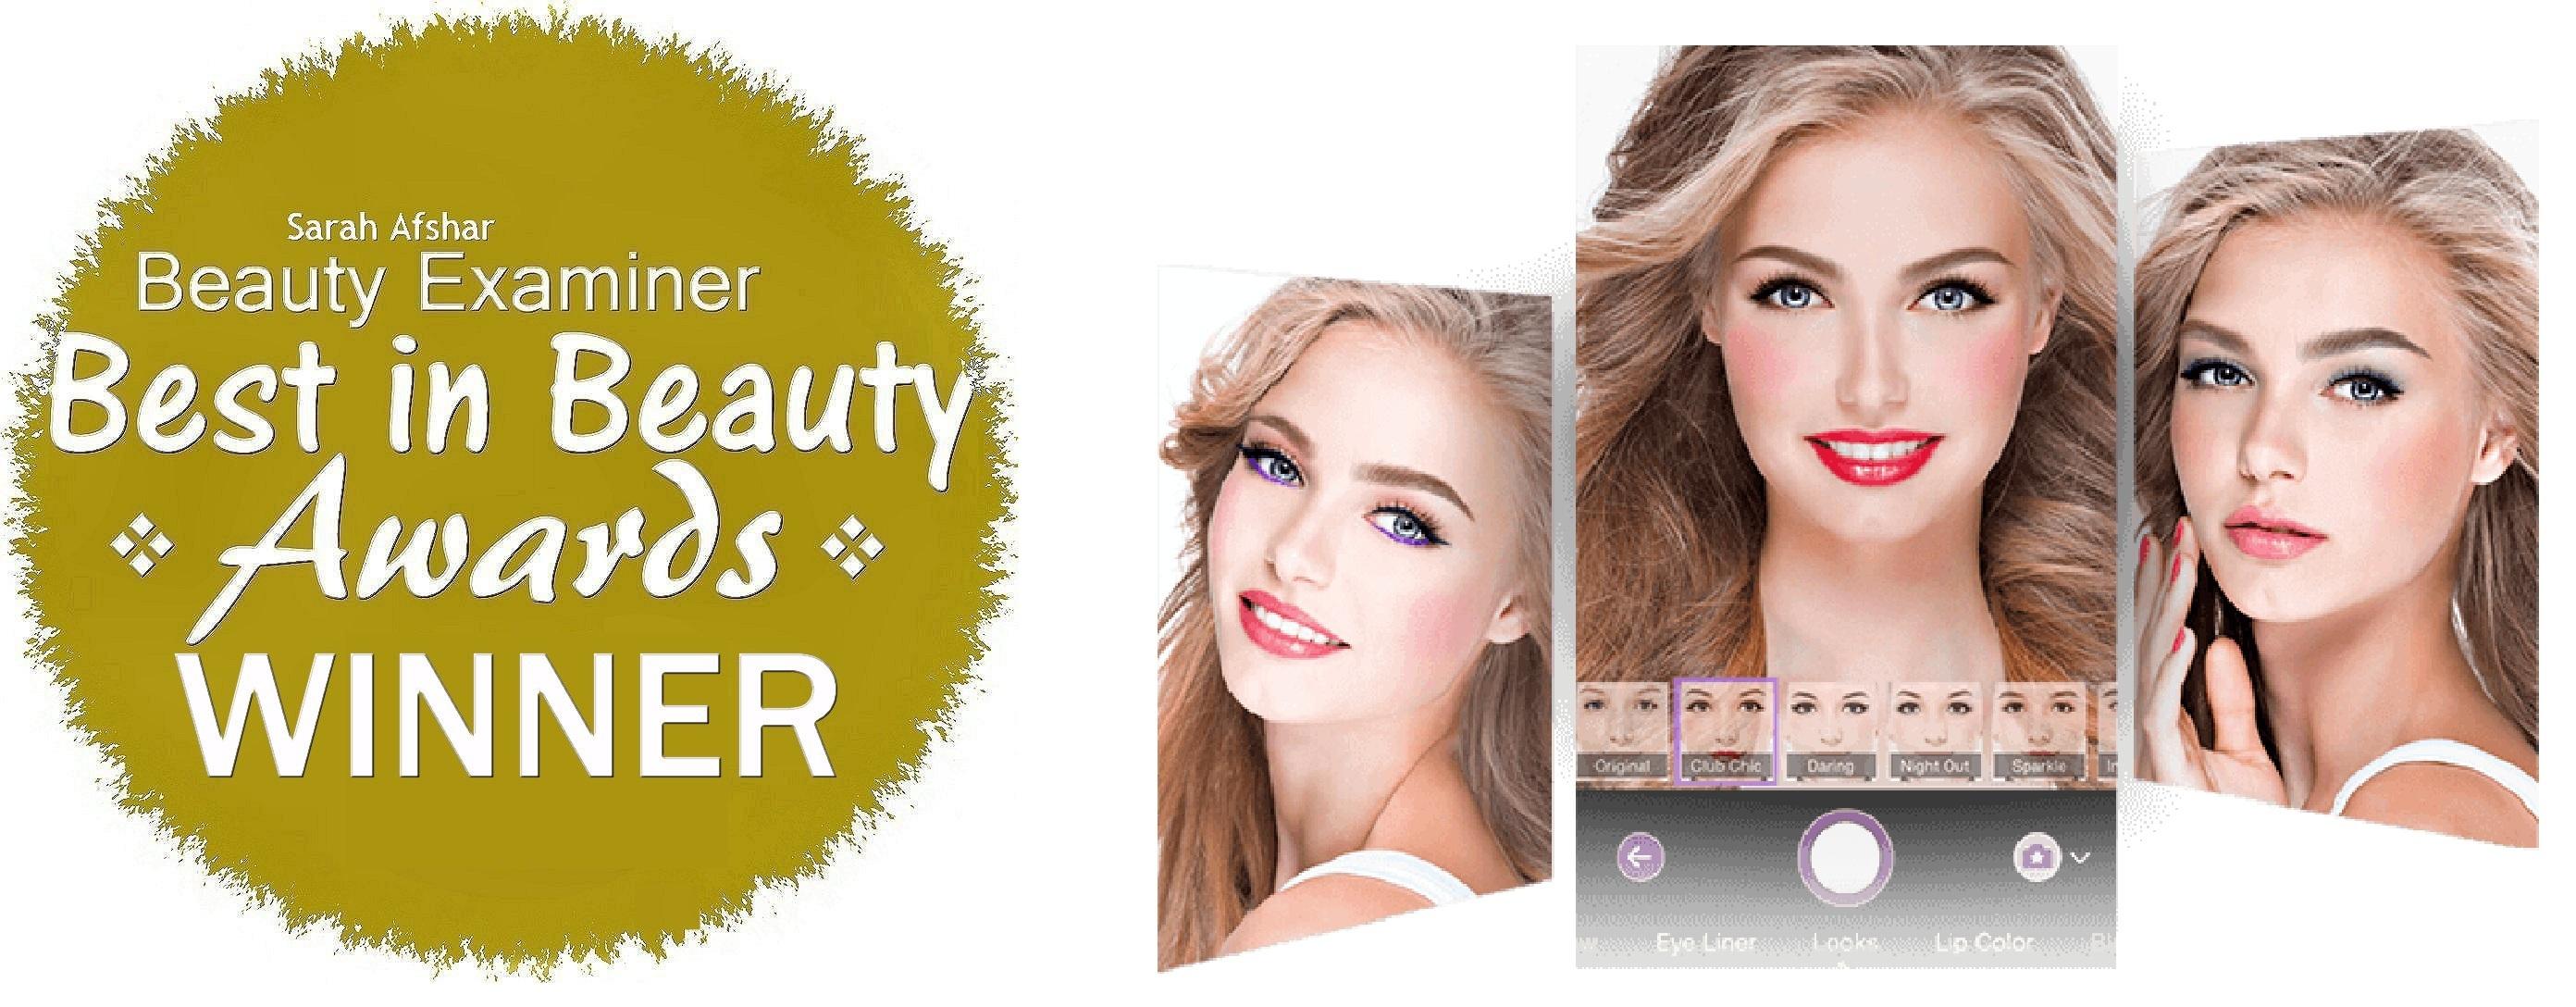 "YouCam Makeup Wins ""Best in Beauty"" Award 2015 for Best"